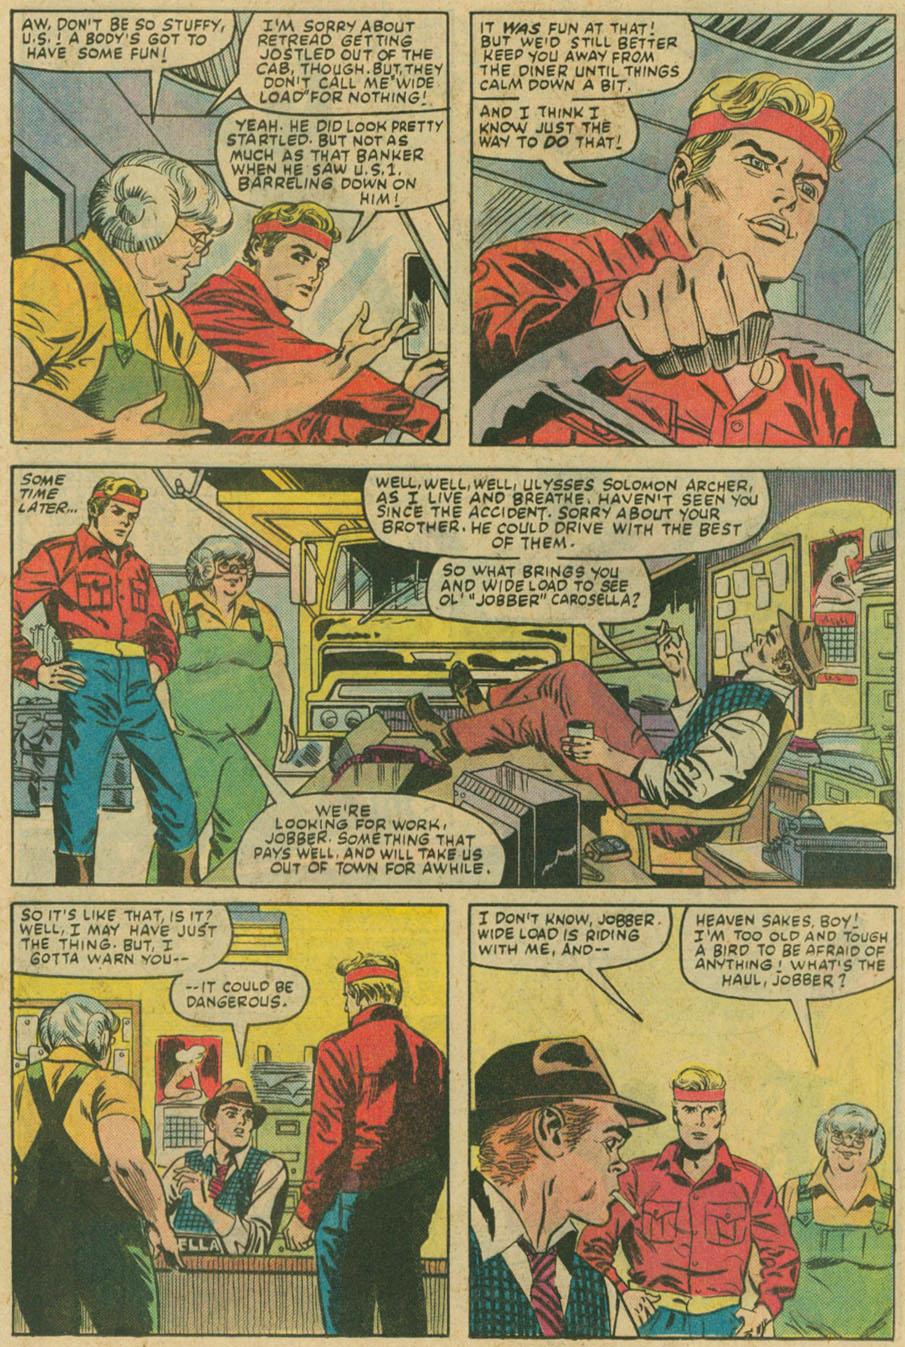 Read online U.S. 1 comic -  Issue #6 - 10